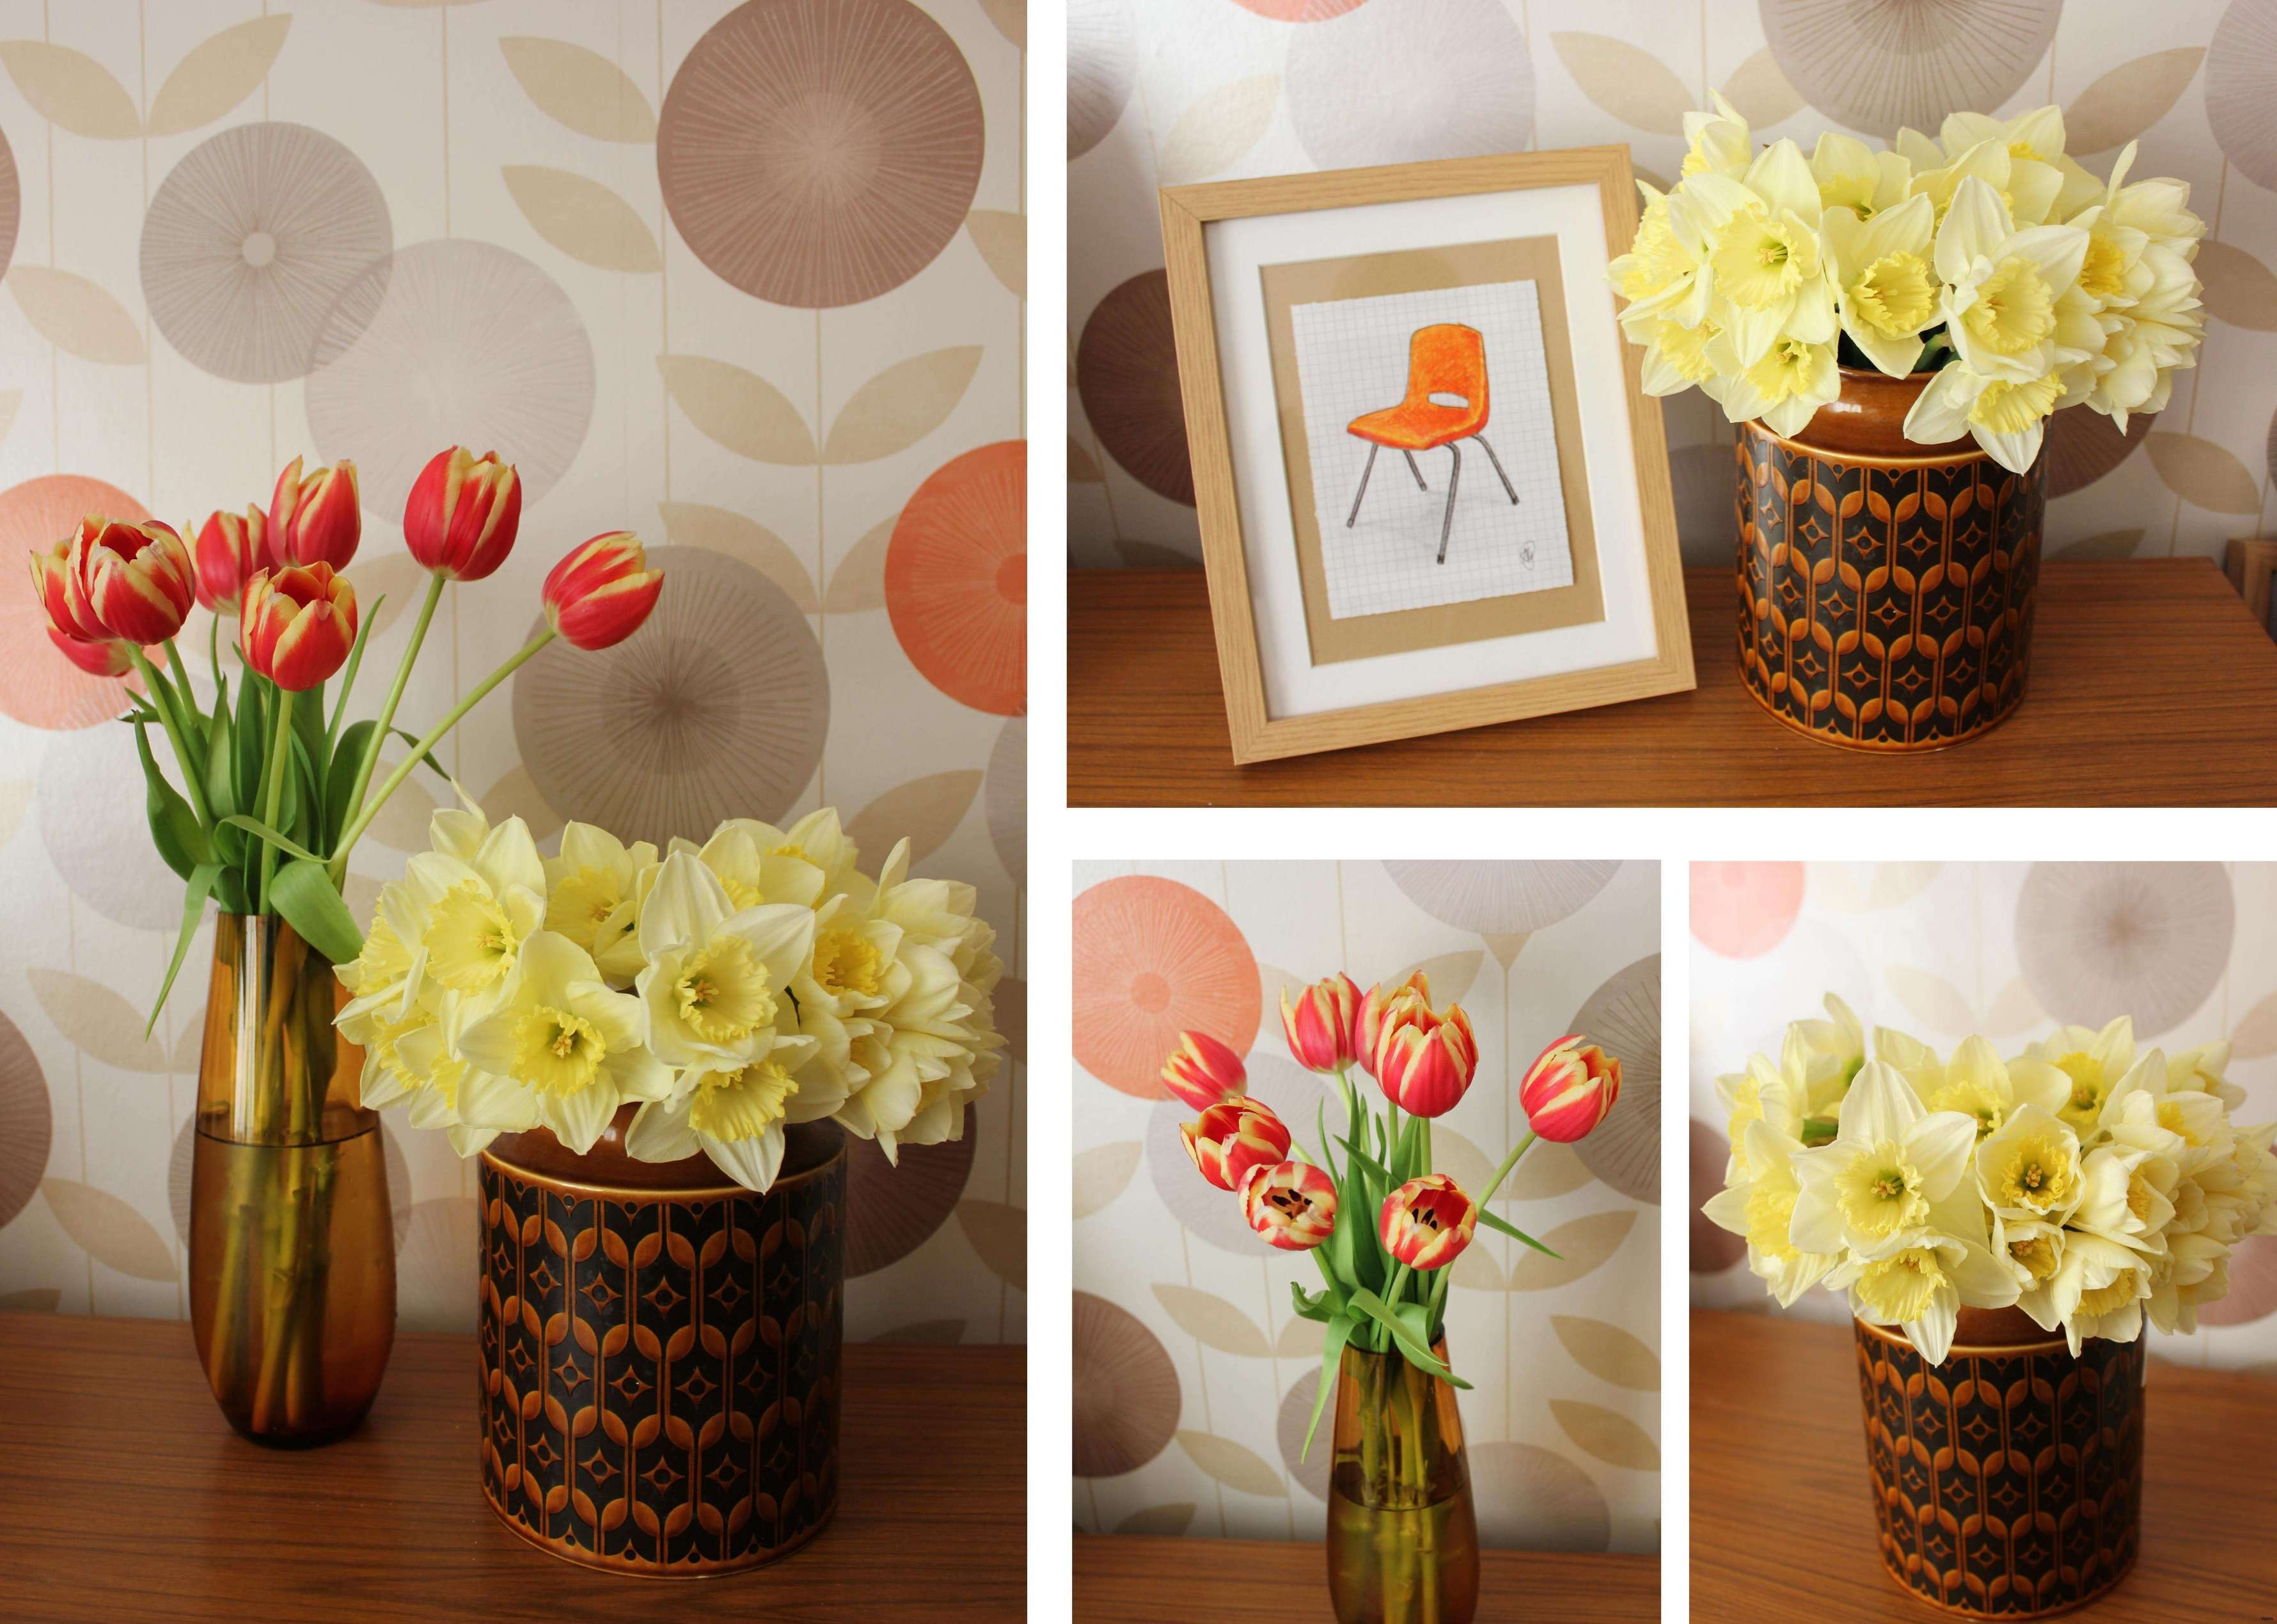 Cheap Vases Walmart Of Wall Decor Flowers Elegant Diy Home Decor Vaseh Vases Decorative with Wall Decor Flowers Elegant Diy Home Decor Vaseh Vases Decorative Flower Ideas I 0d Design Ideas